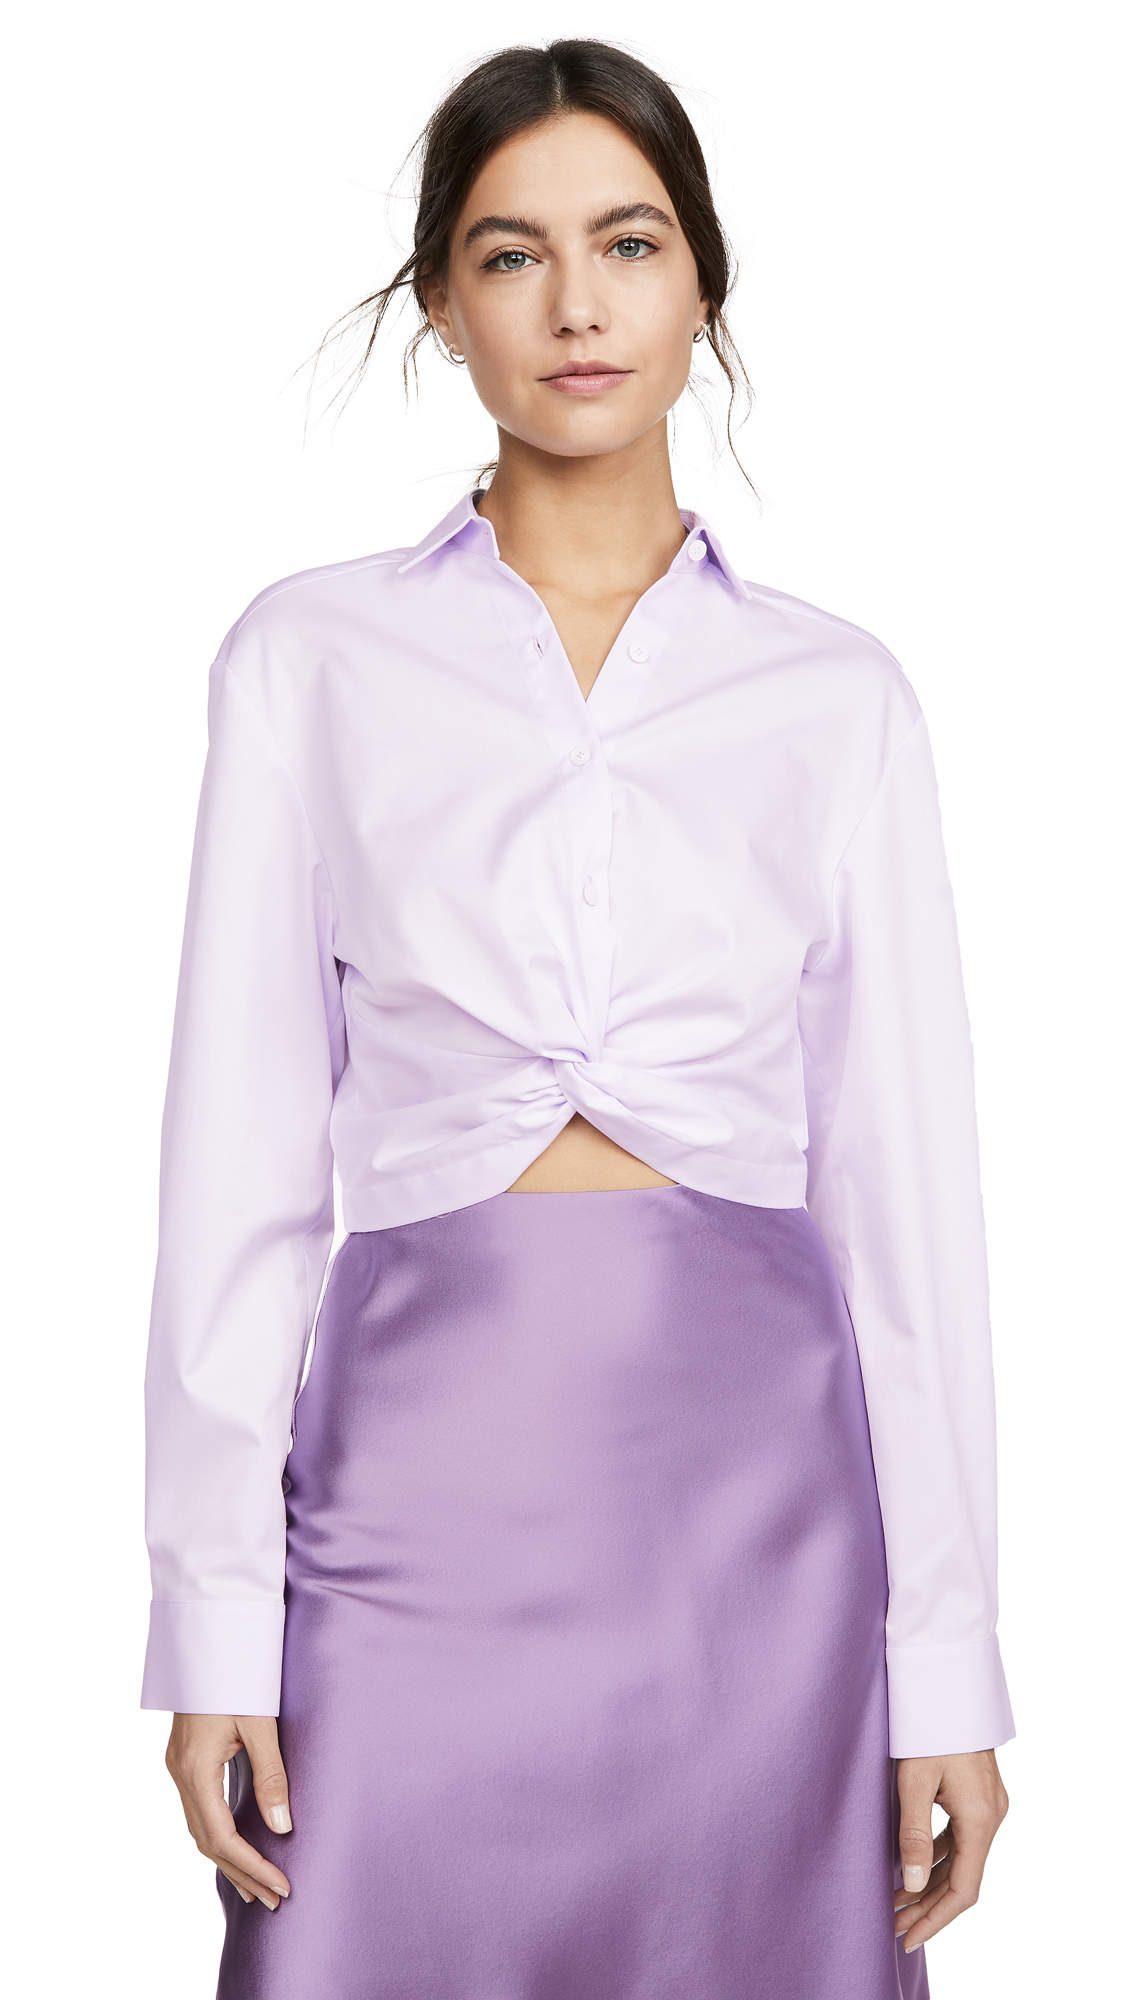 Dion Lee Twist Placket Shirt - 60% Off Sale